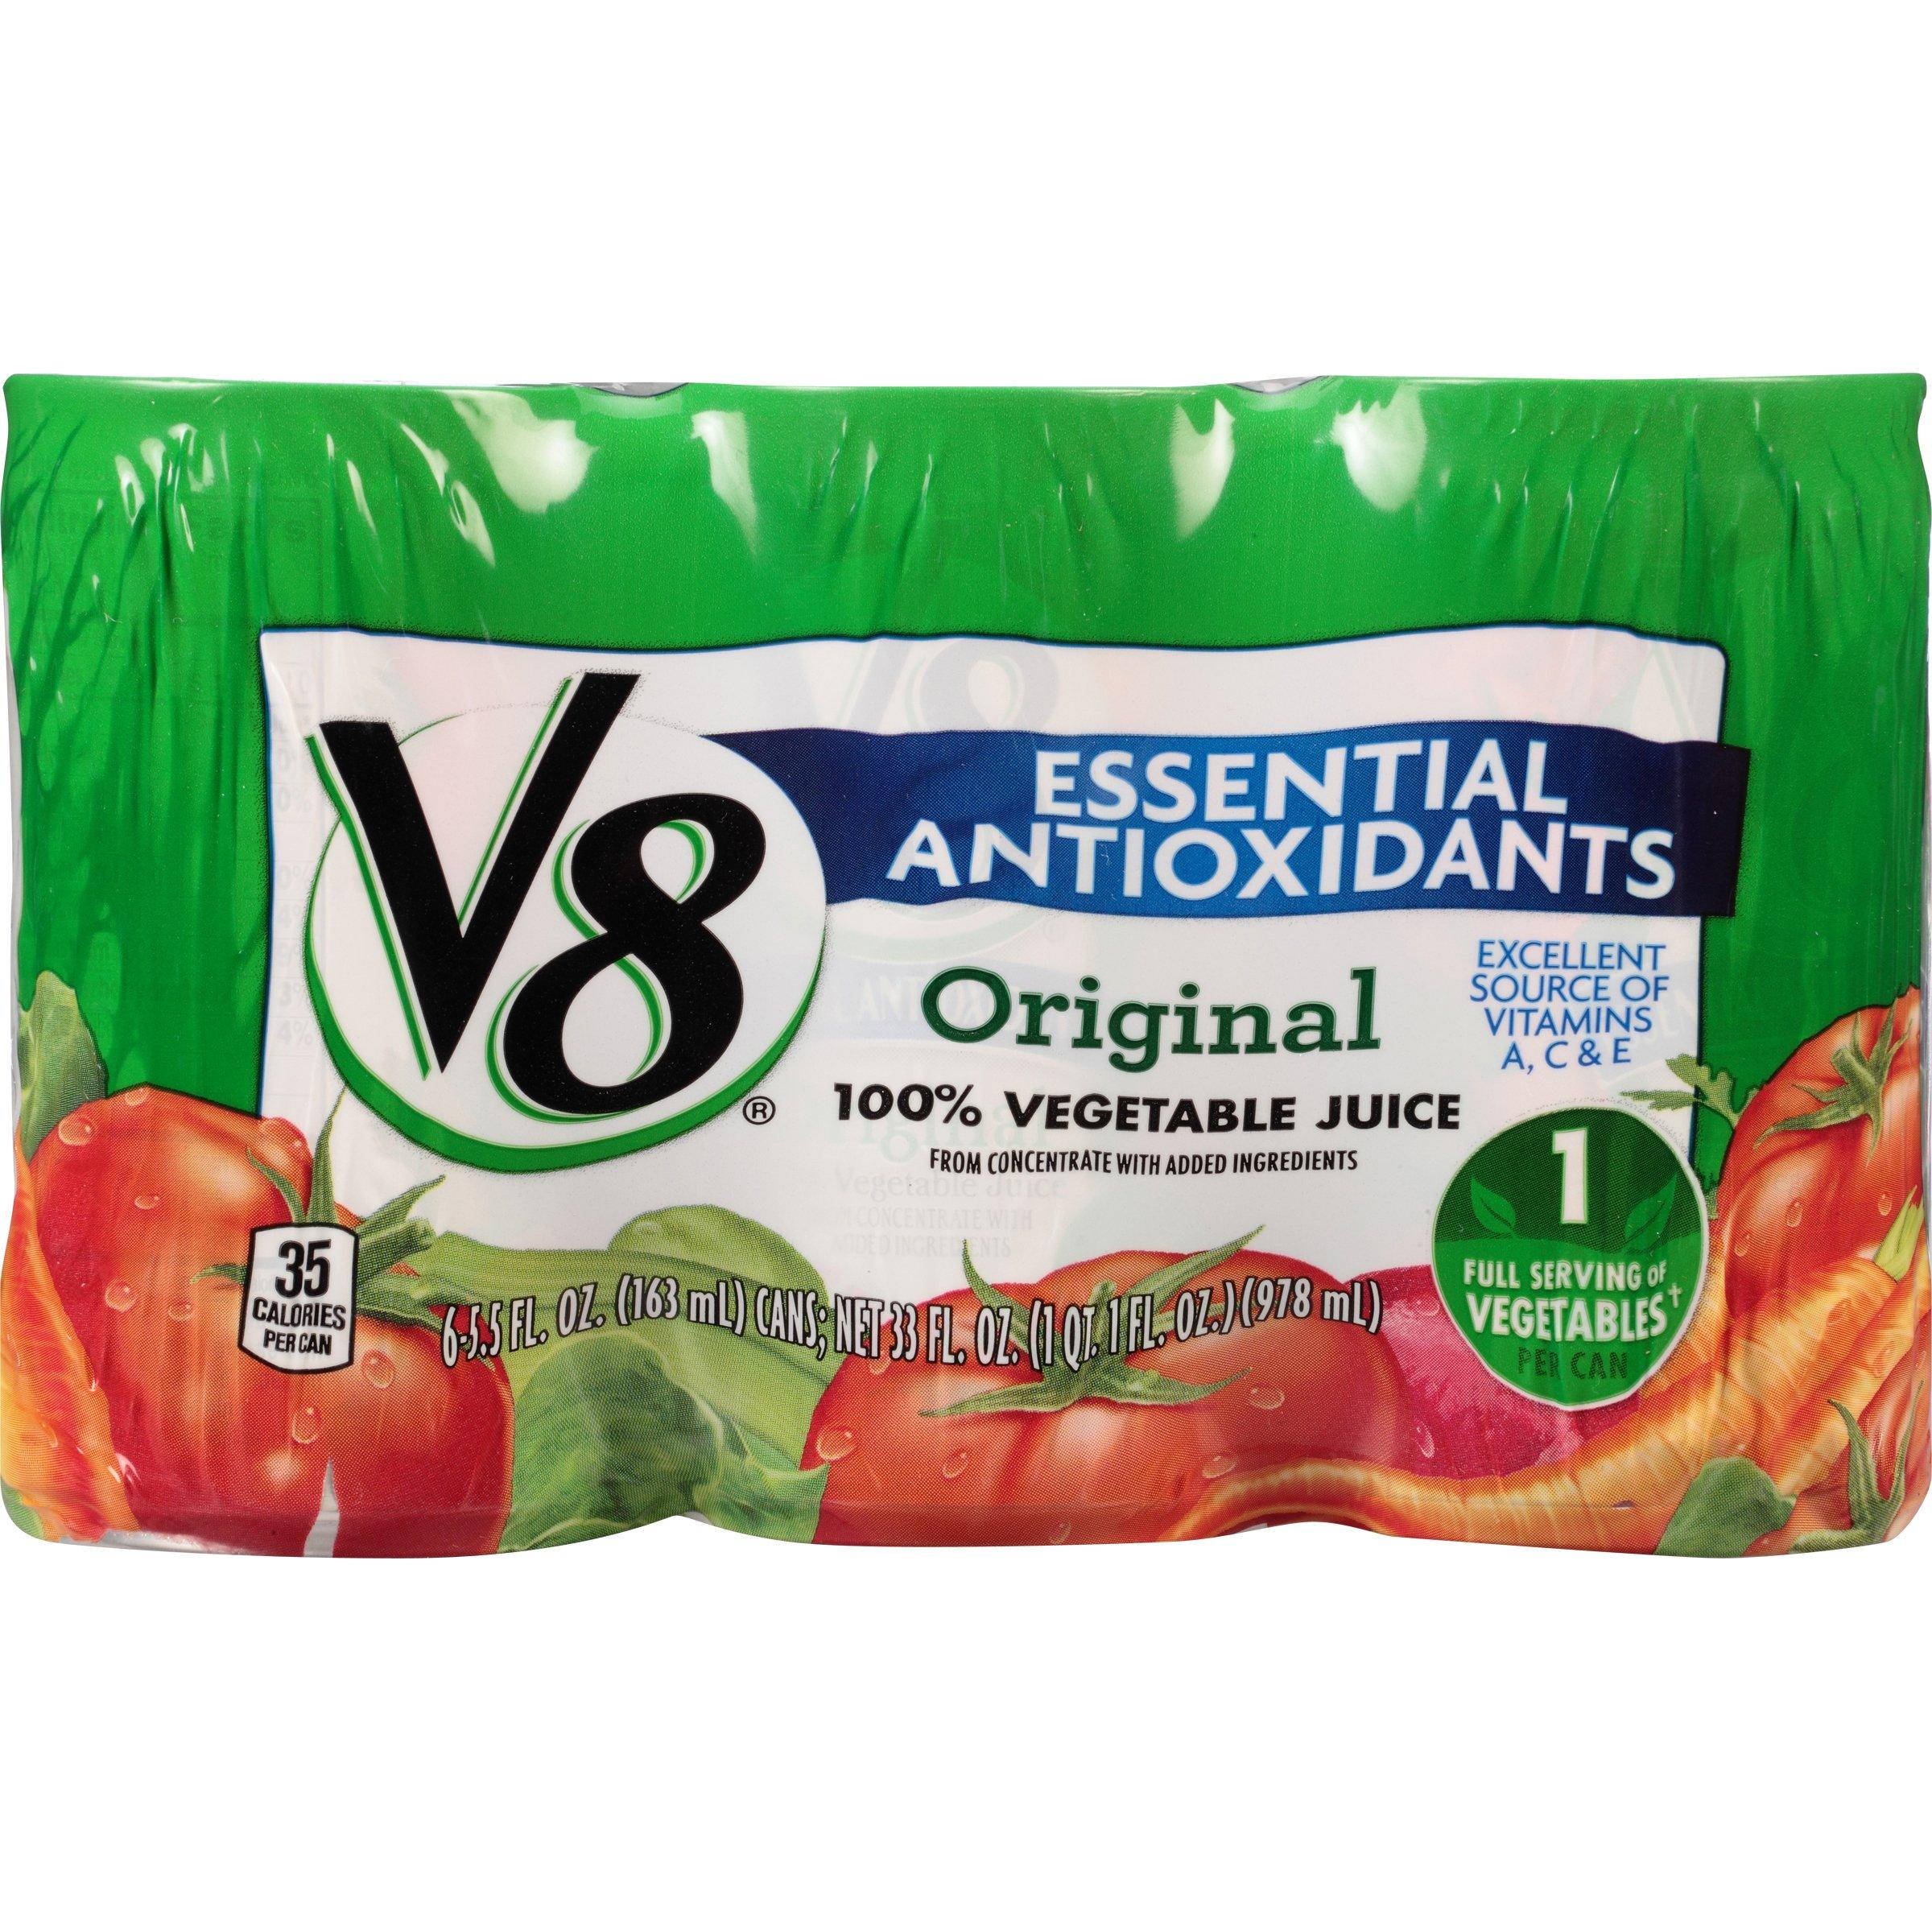 V8 Original Essential Antioxidants 100% Vegetable Juice, 5.5 oz. Can (8 packs of 6, Total of 48)